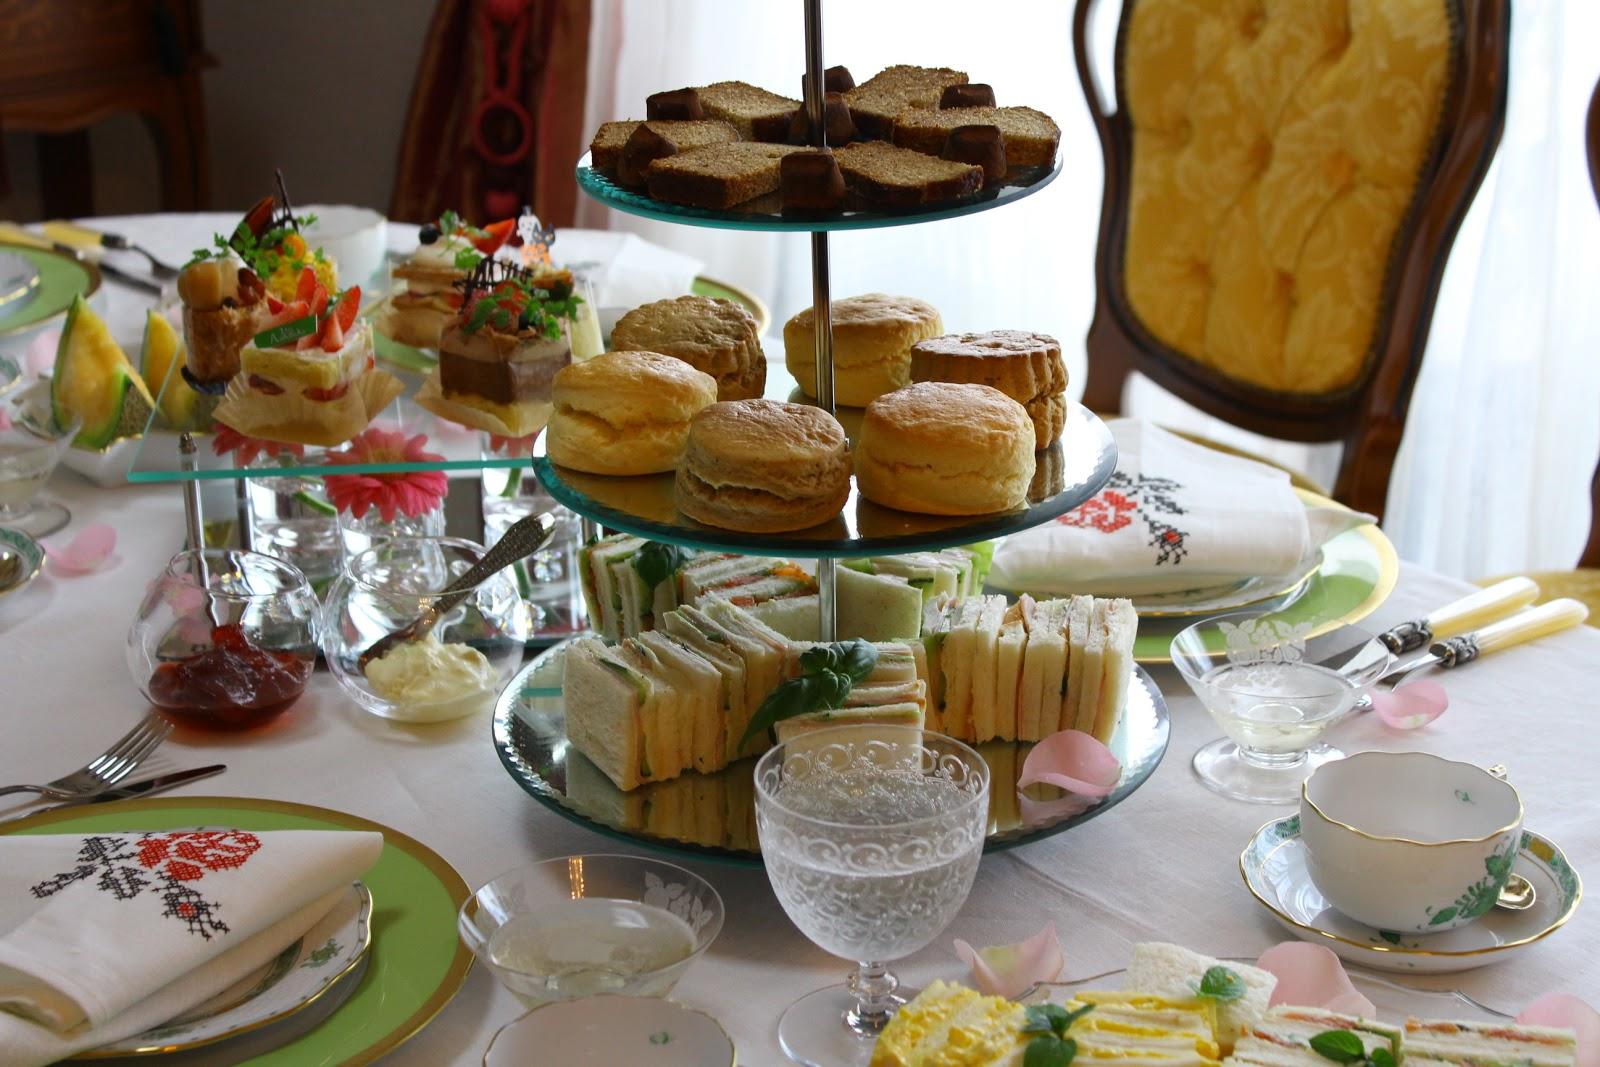 table de france  afternoon tea table decoration